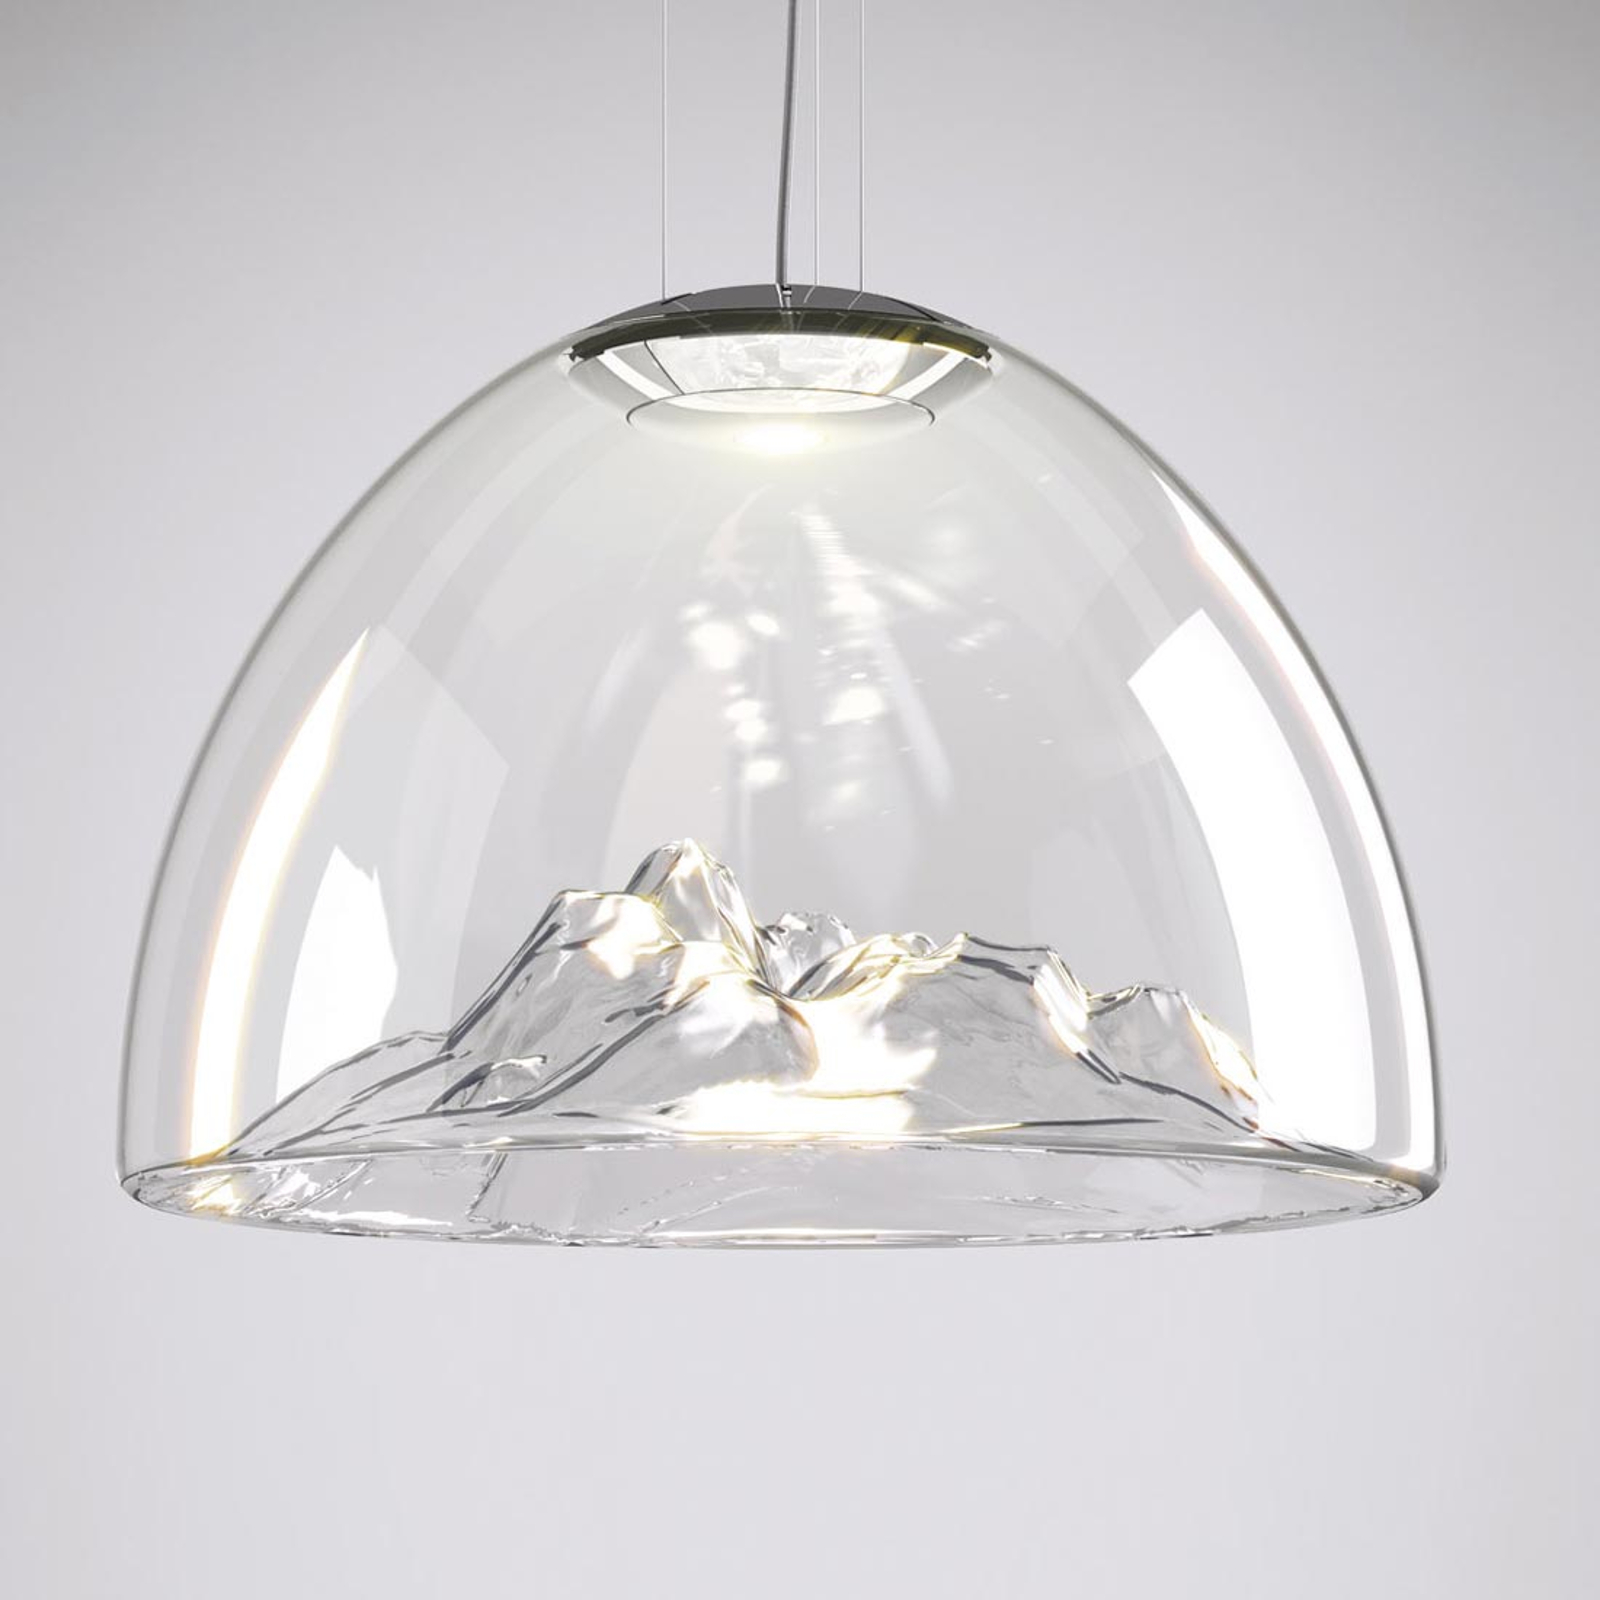 Axolight Mountain View - LED-Hängelampe klar-chrom